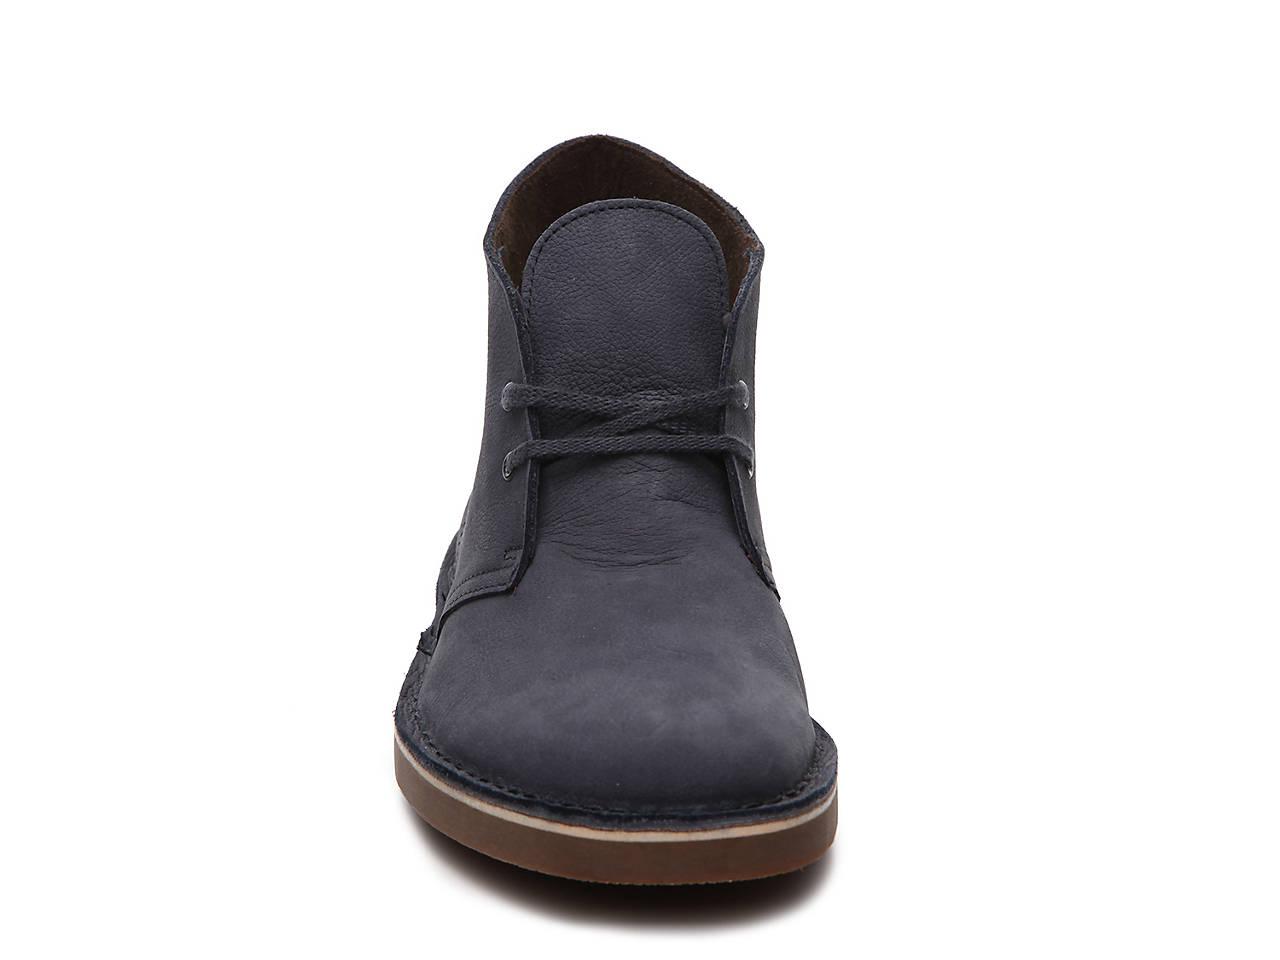 b48f10d0fc6 Bushacre 2 Chukka Boot